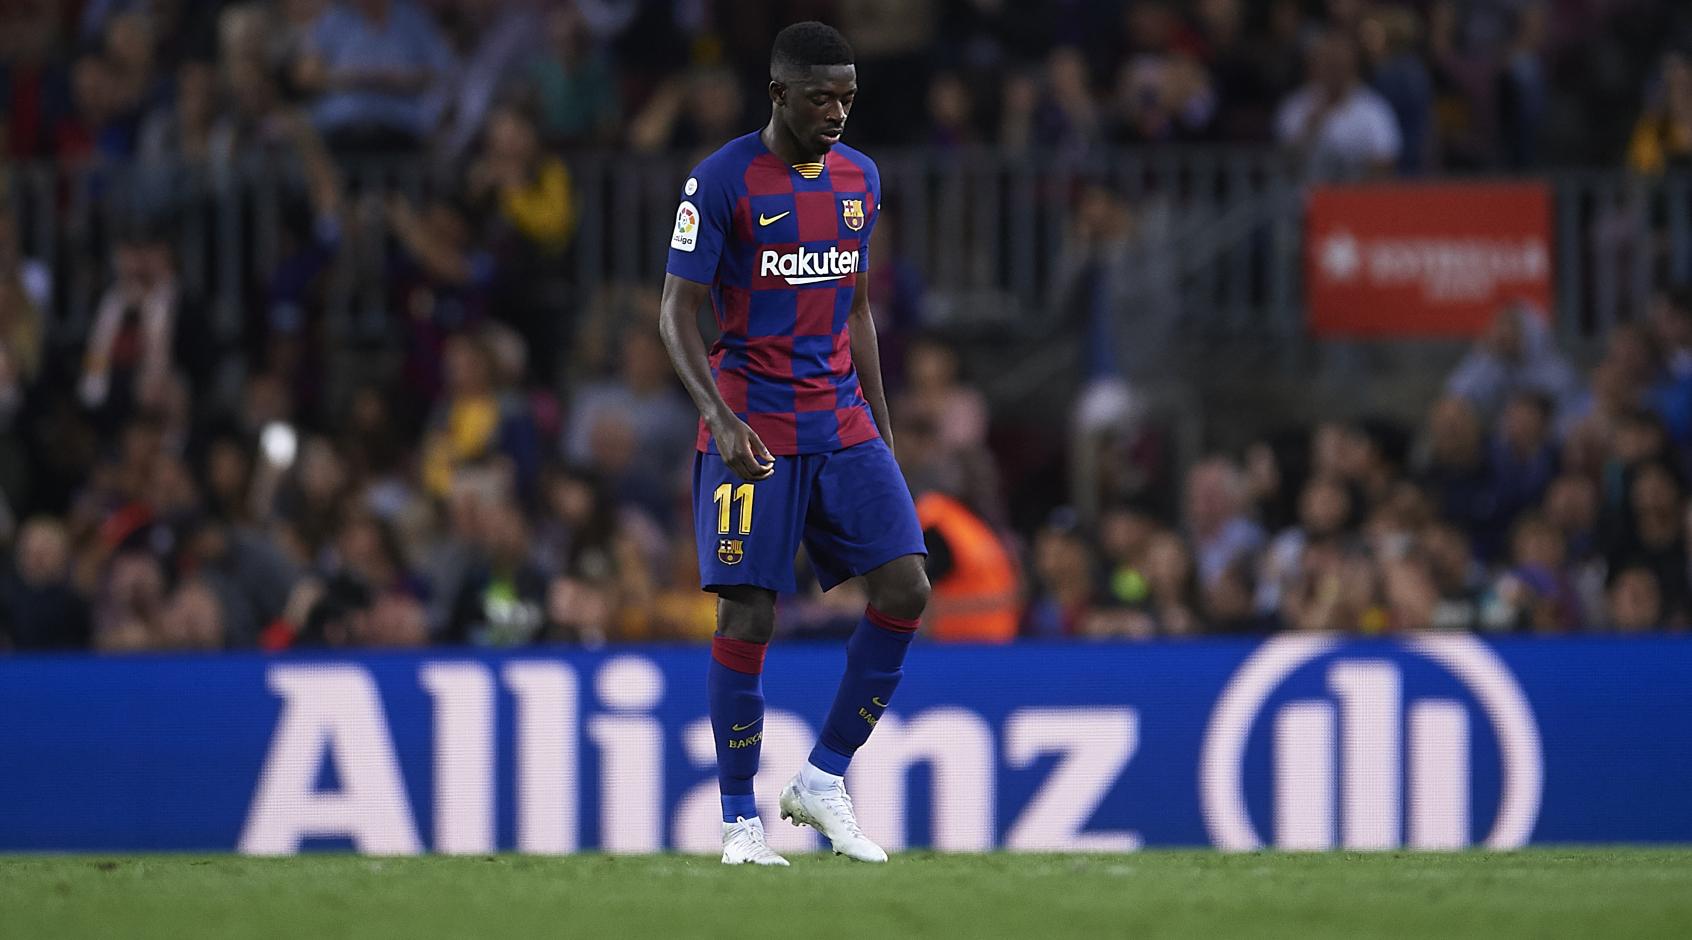 Liga Chempionov Yuventus Barselona 0 1 Gol Dembele Video Footboom